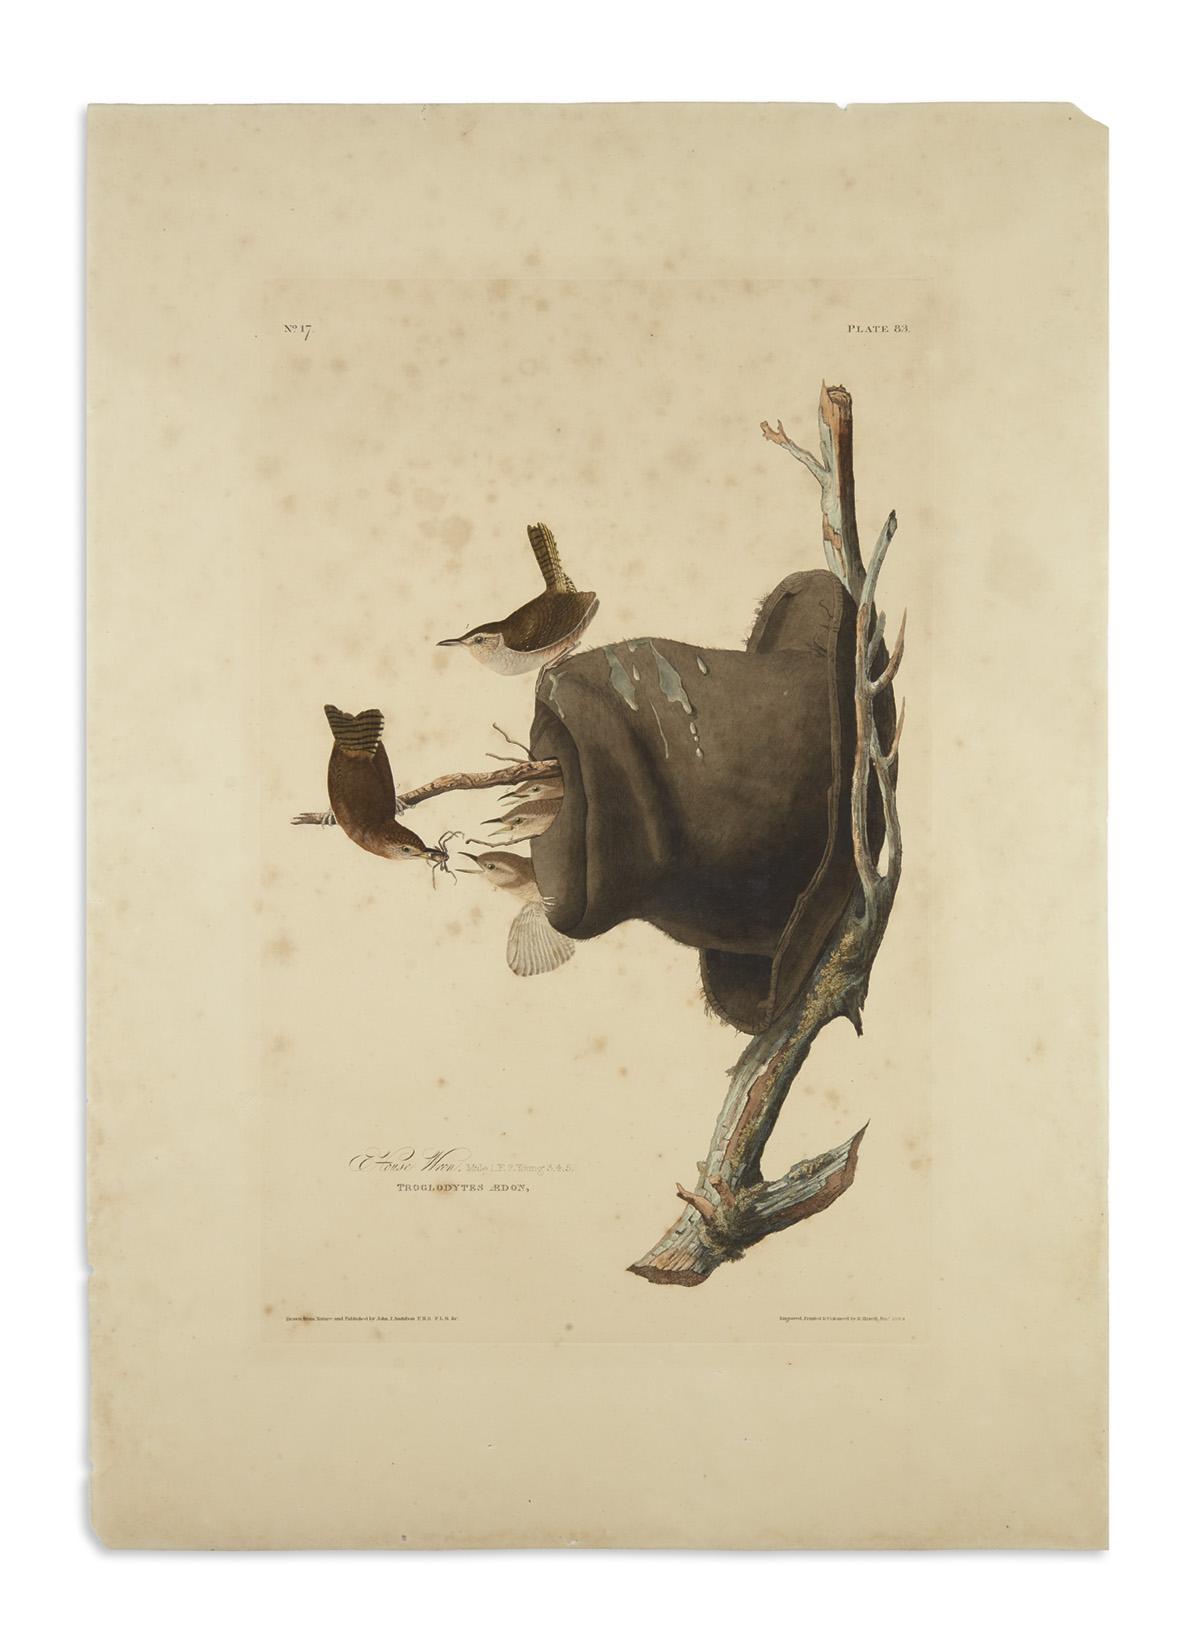 AUDUBON-JOHN-JAMES-House-Wren-Plate-83